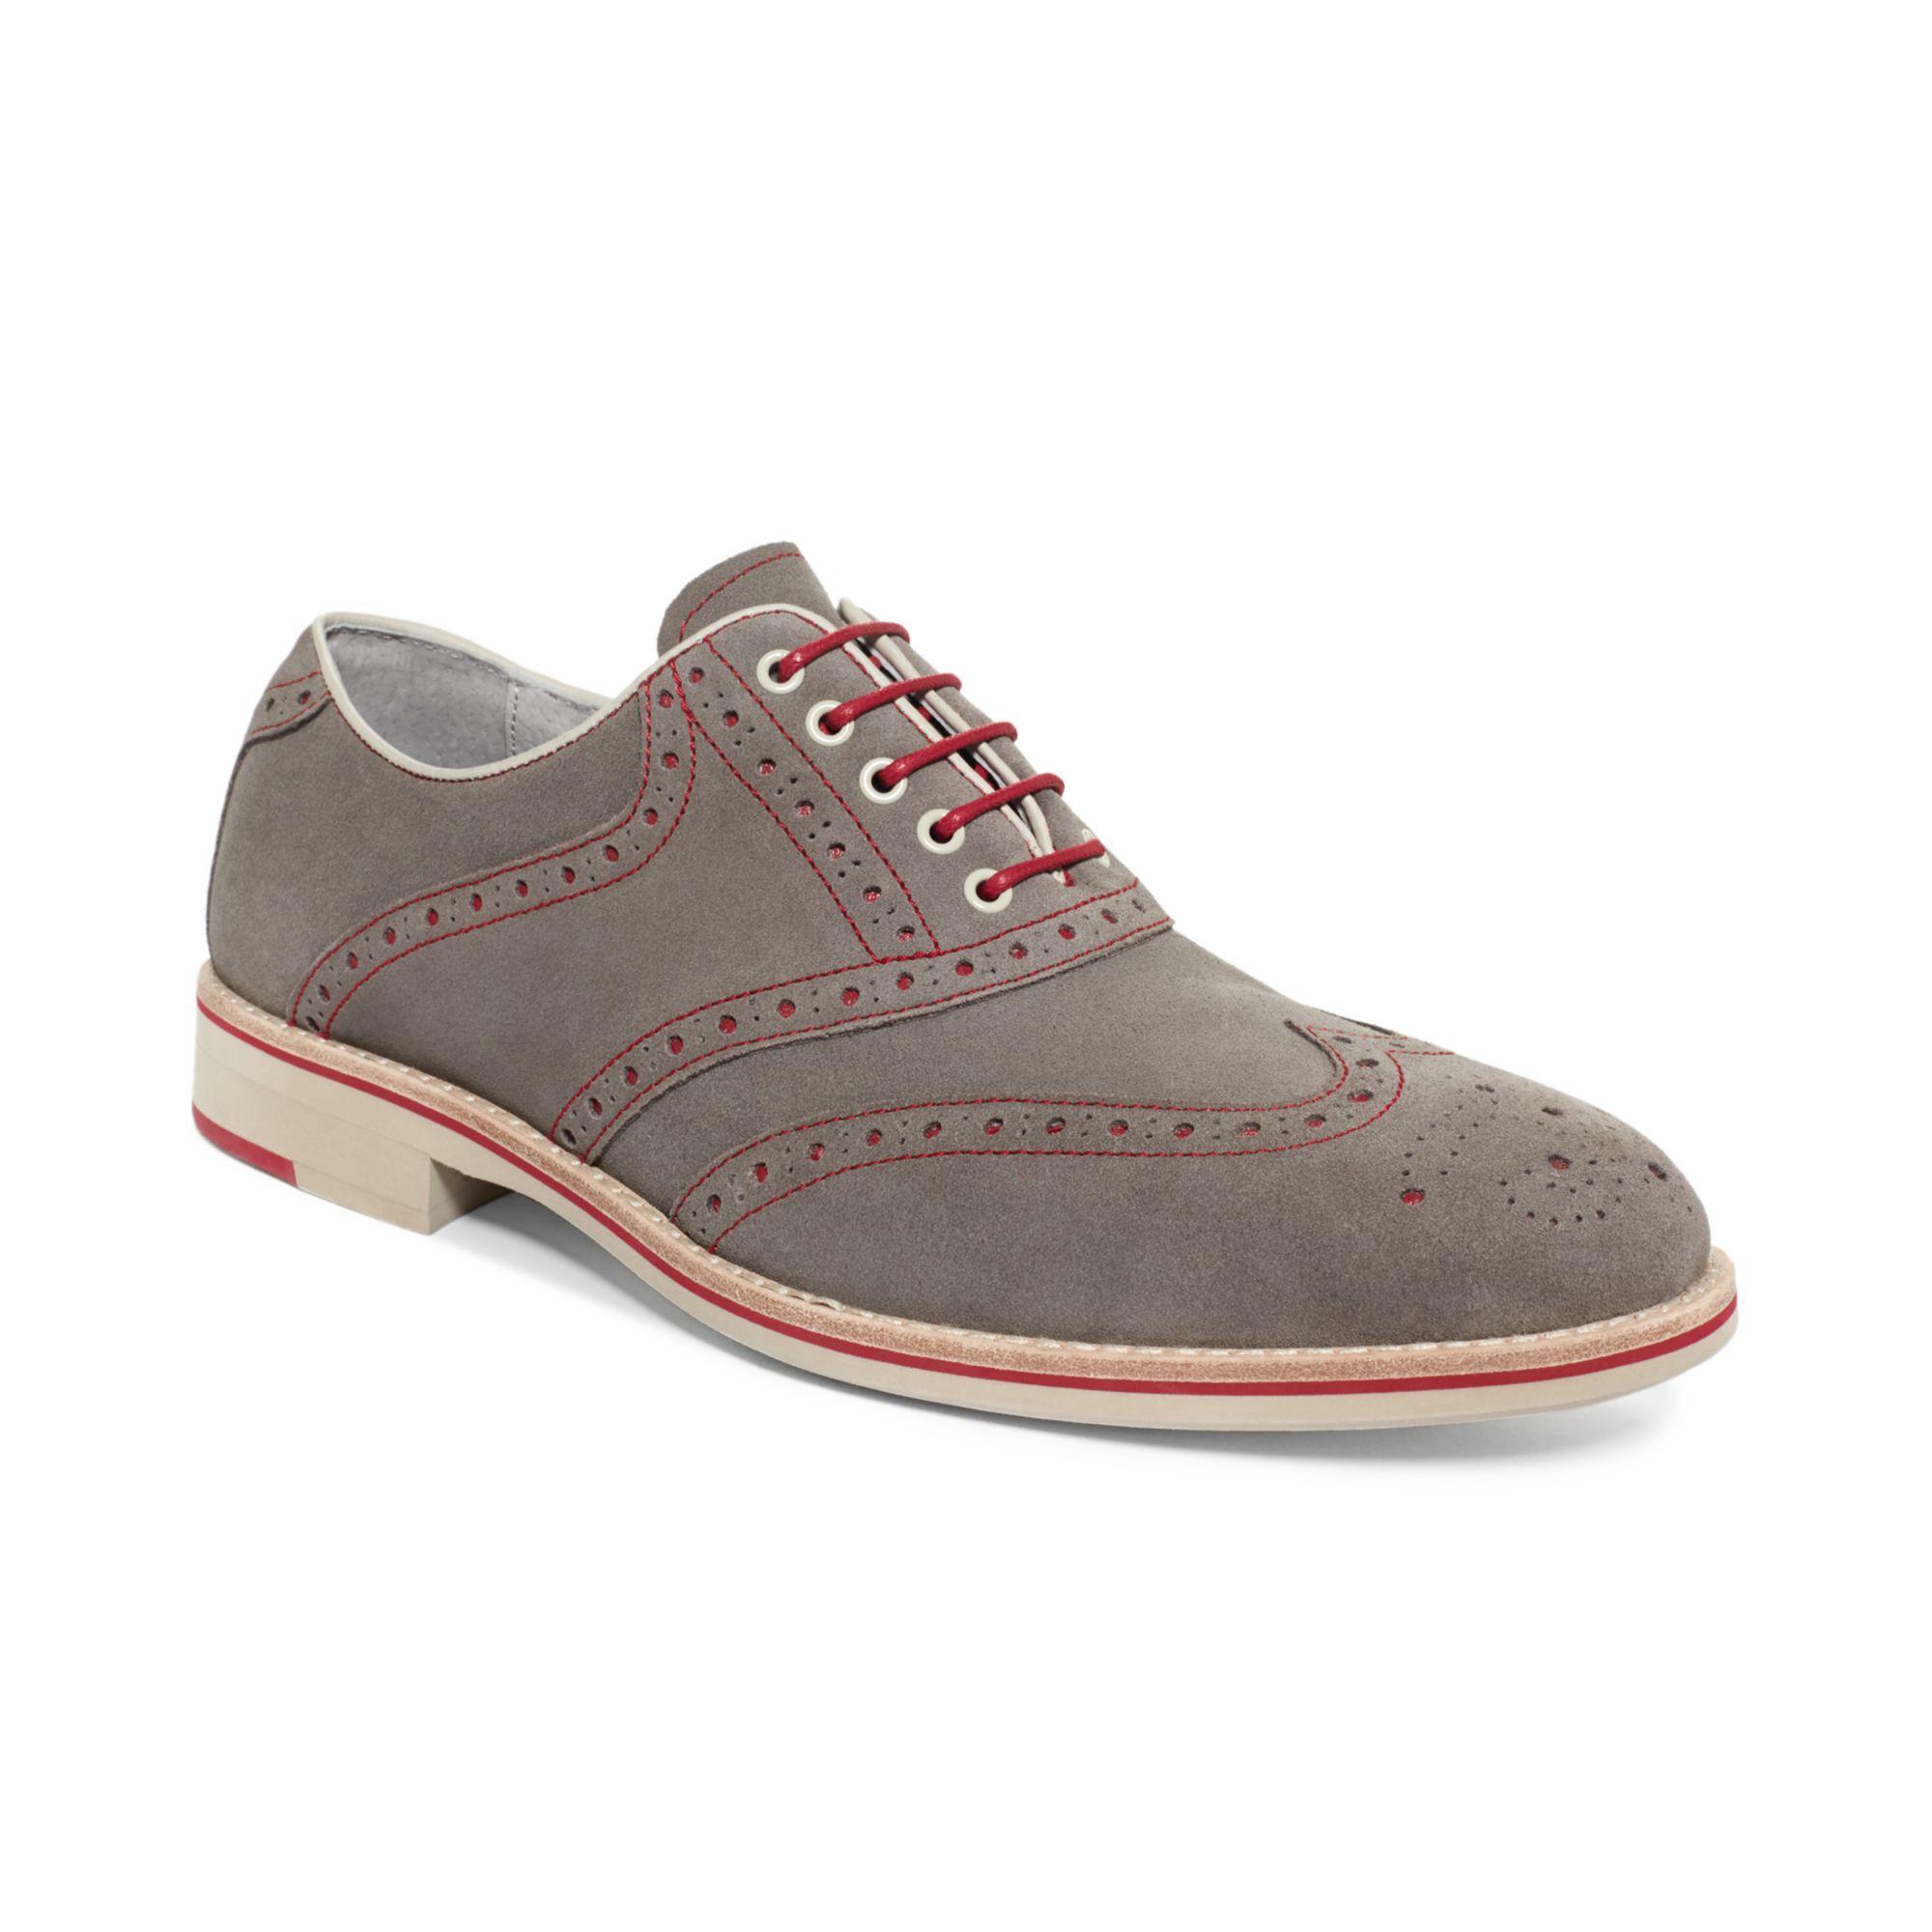 Ecco Wingtip Shoes Slip Resistant